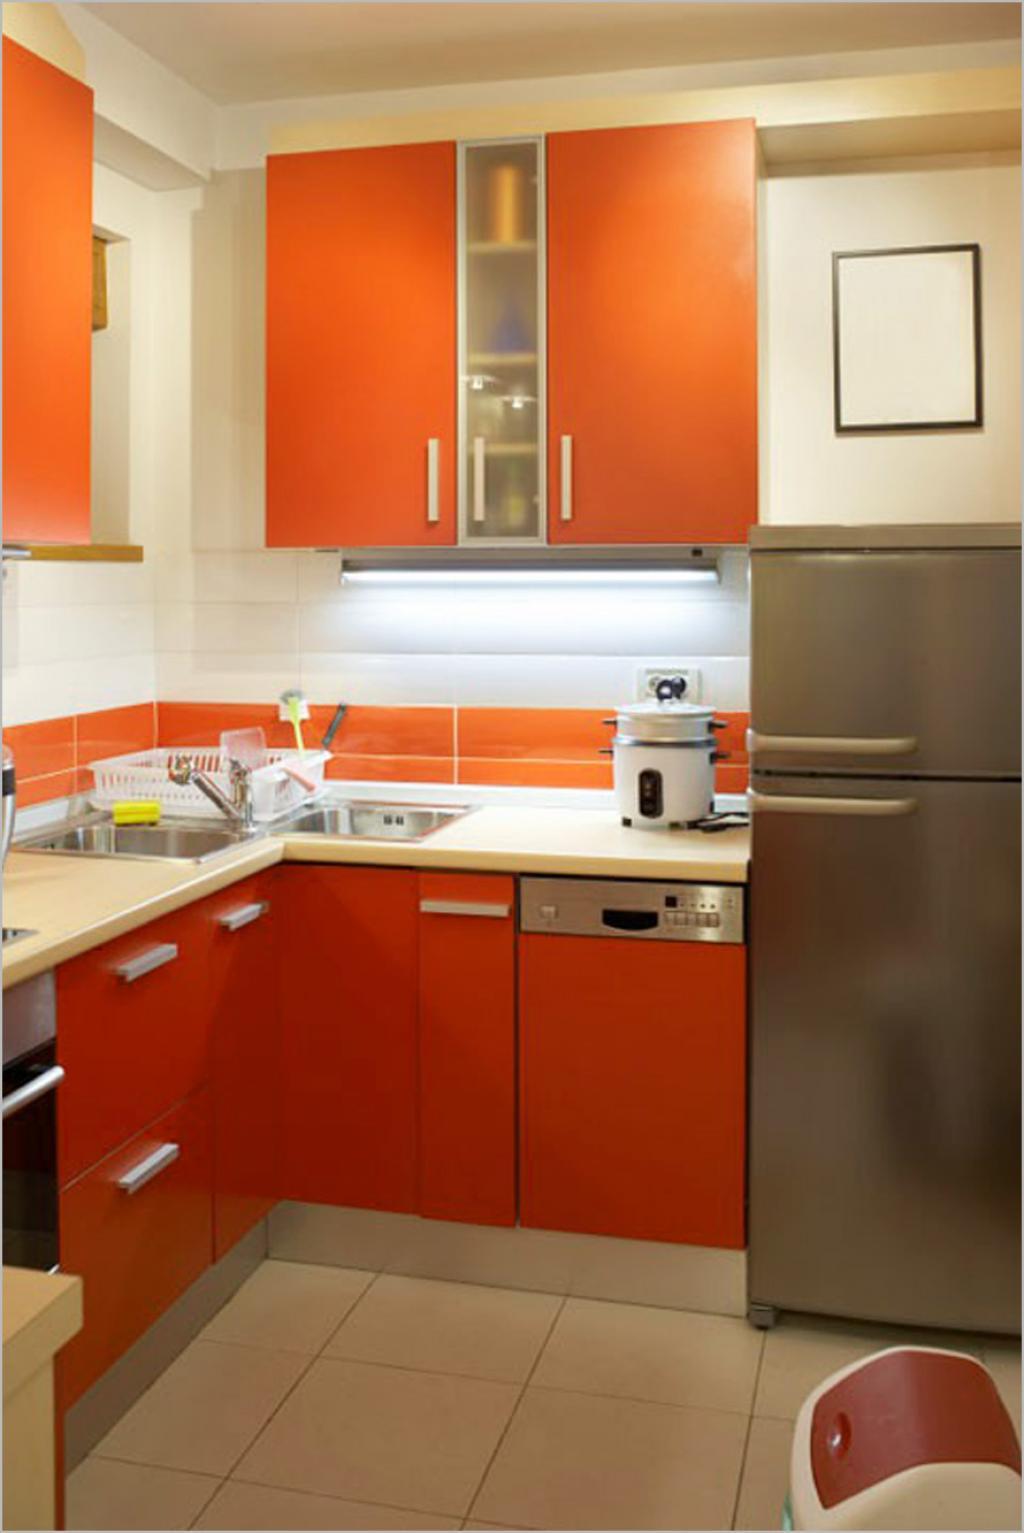 small kitchen designs ideas photo - 1